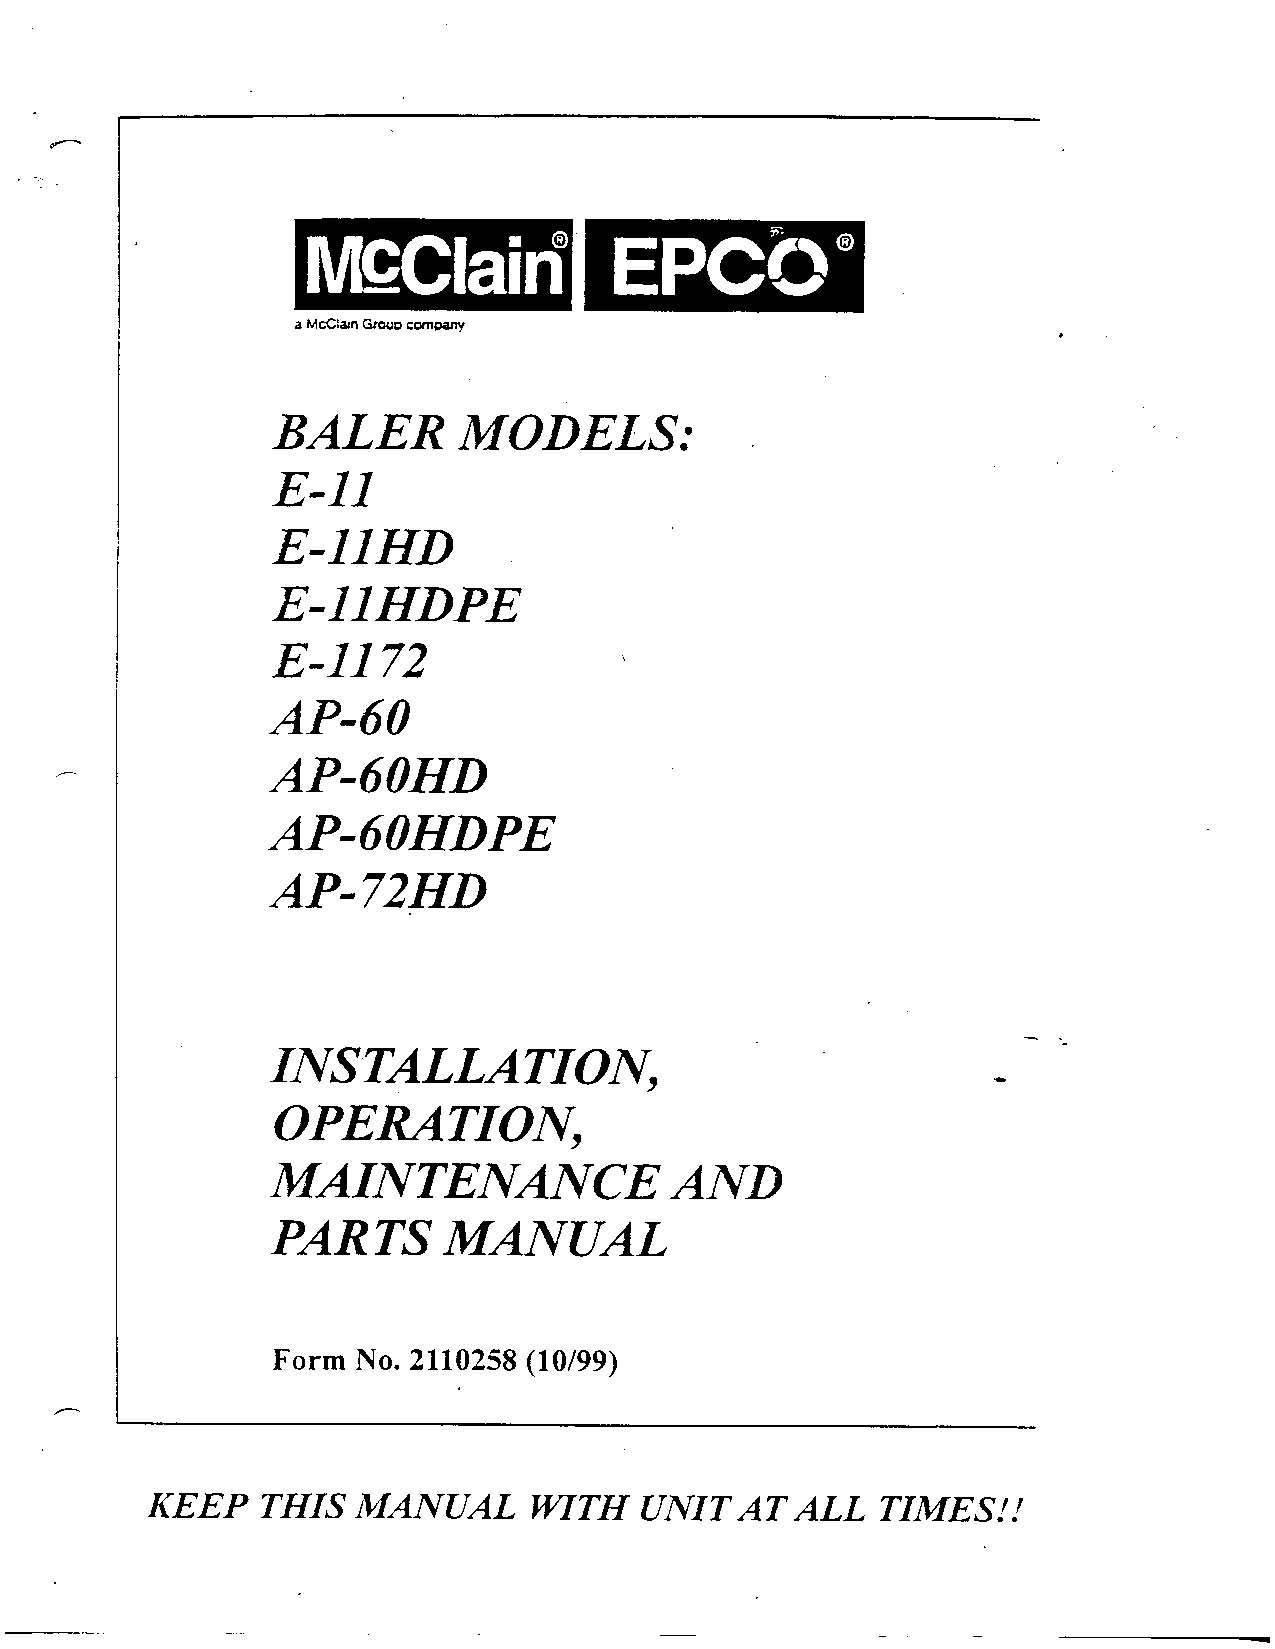 mcclain_epco_manual_page_1 baler and shredder operators manuals piqua baler wiring diagram at eliteediting.co